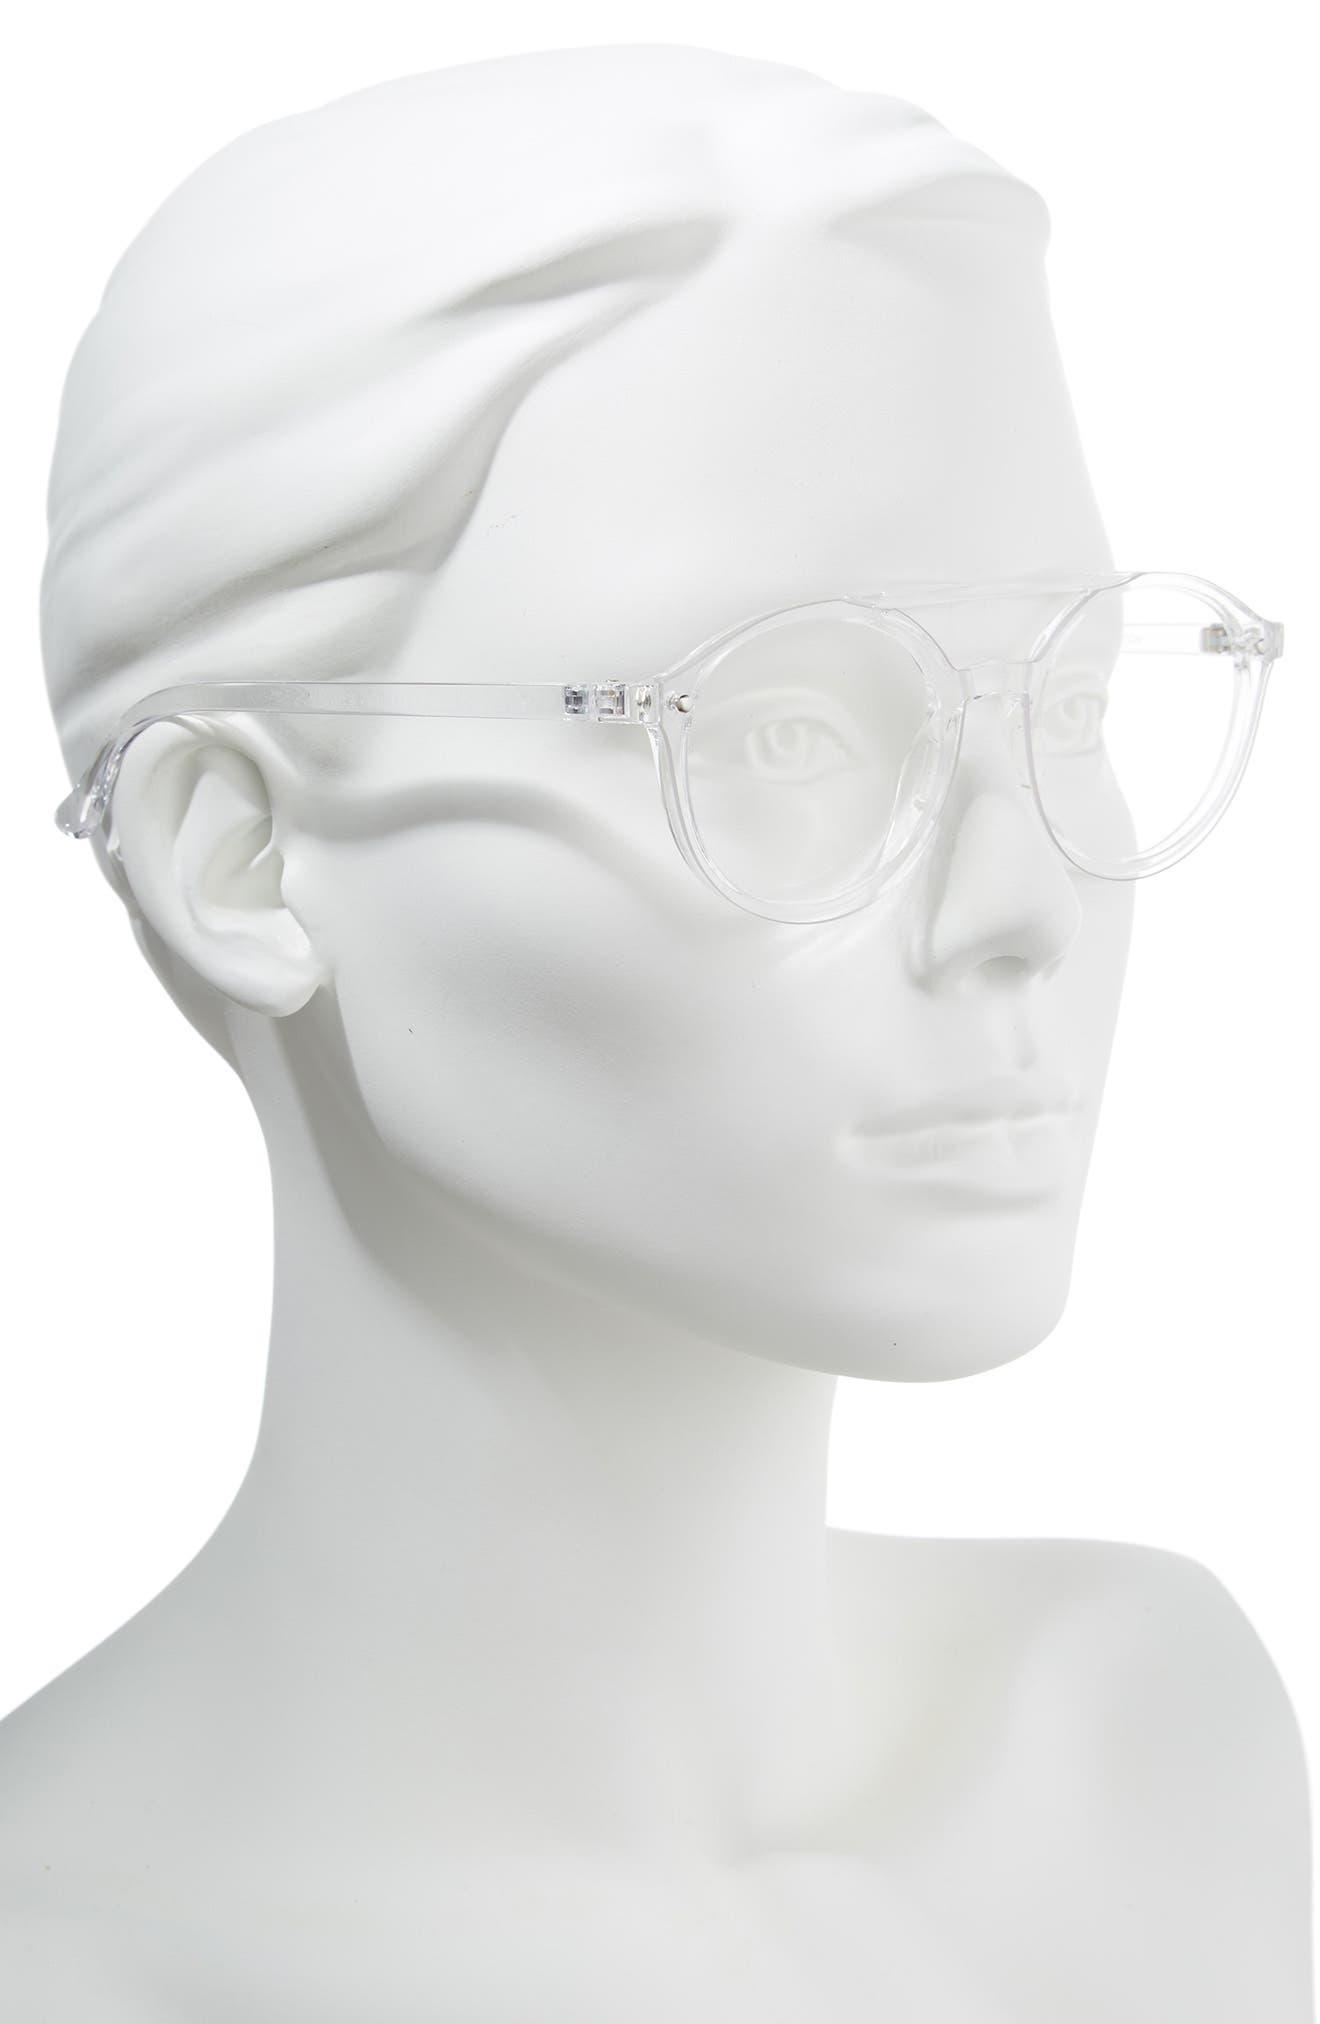 54mm Aviator Fashion Glasses,                             Alternate thumbnail 2, color,                             CLEAR